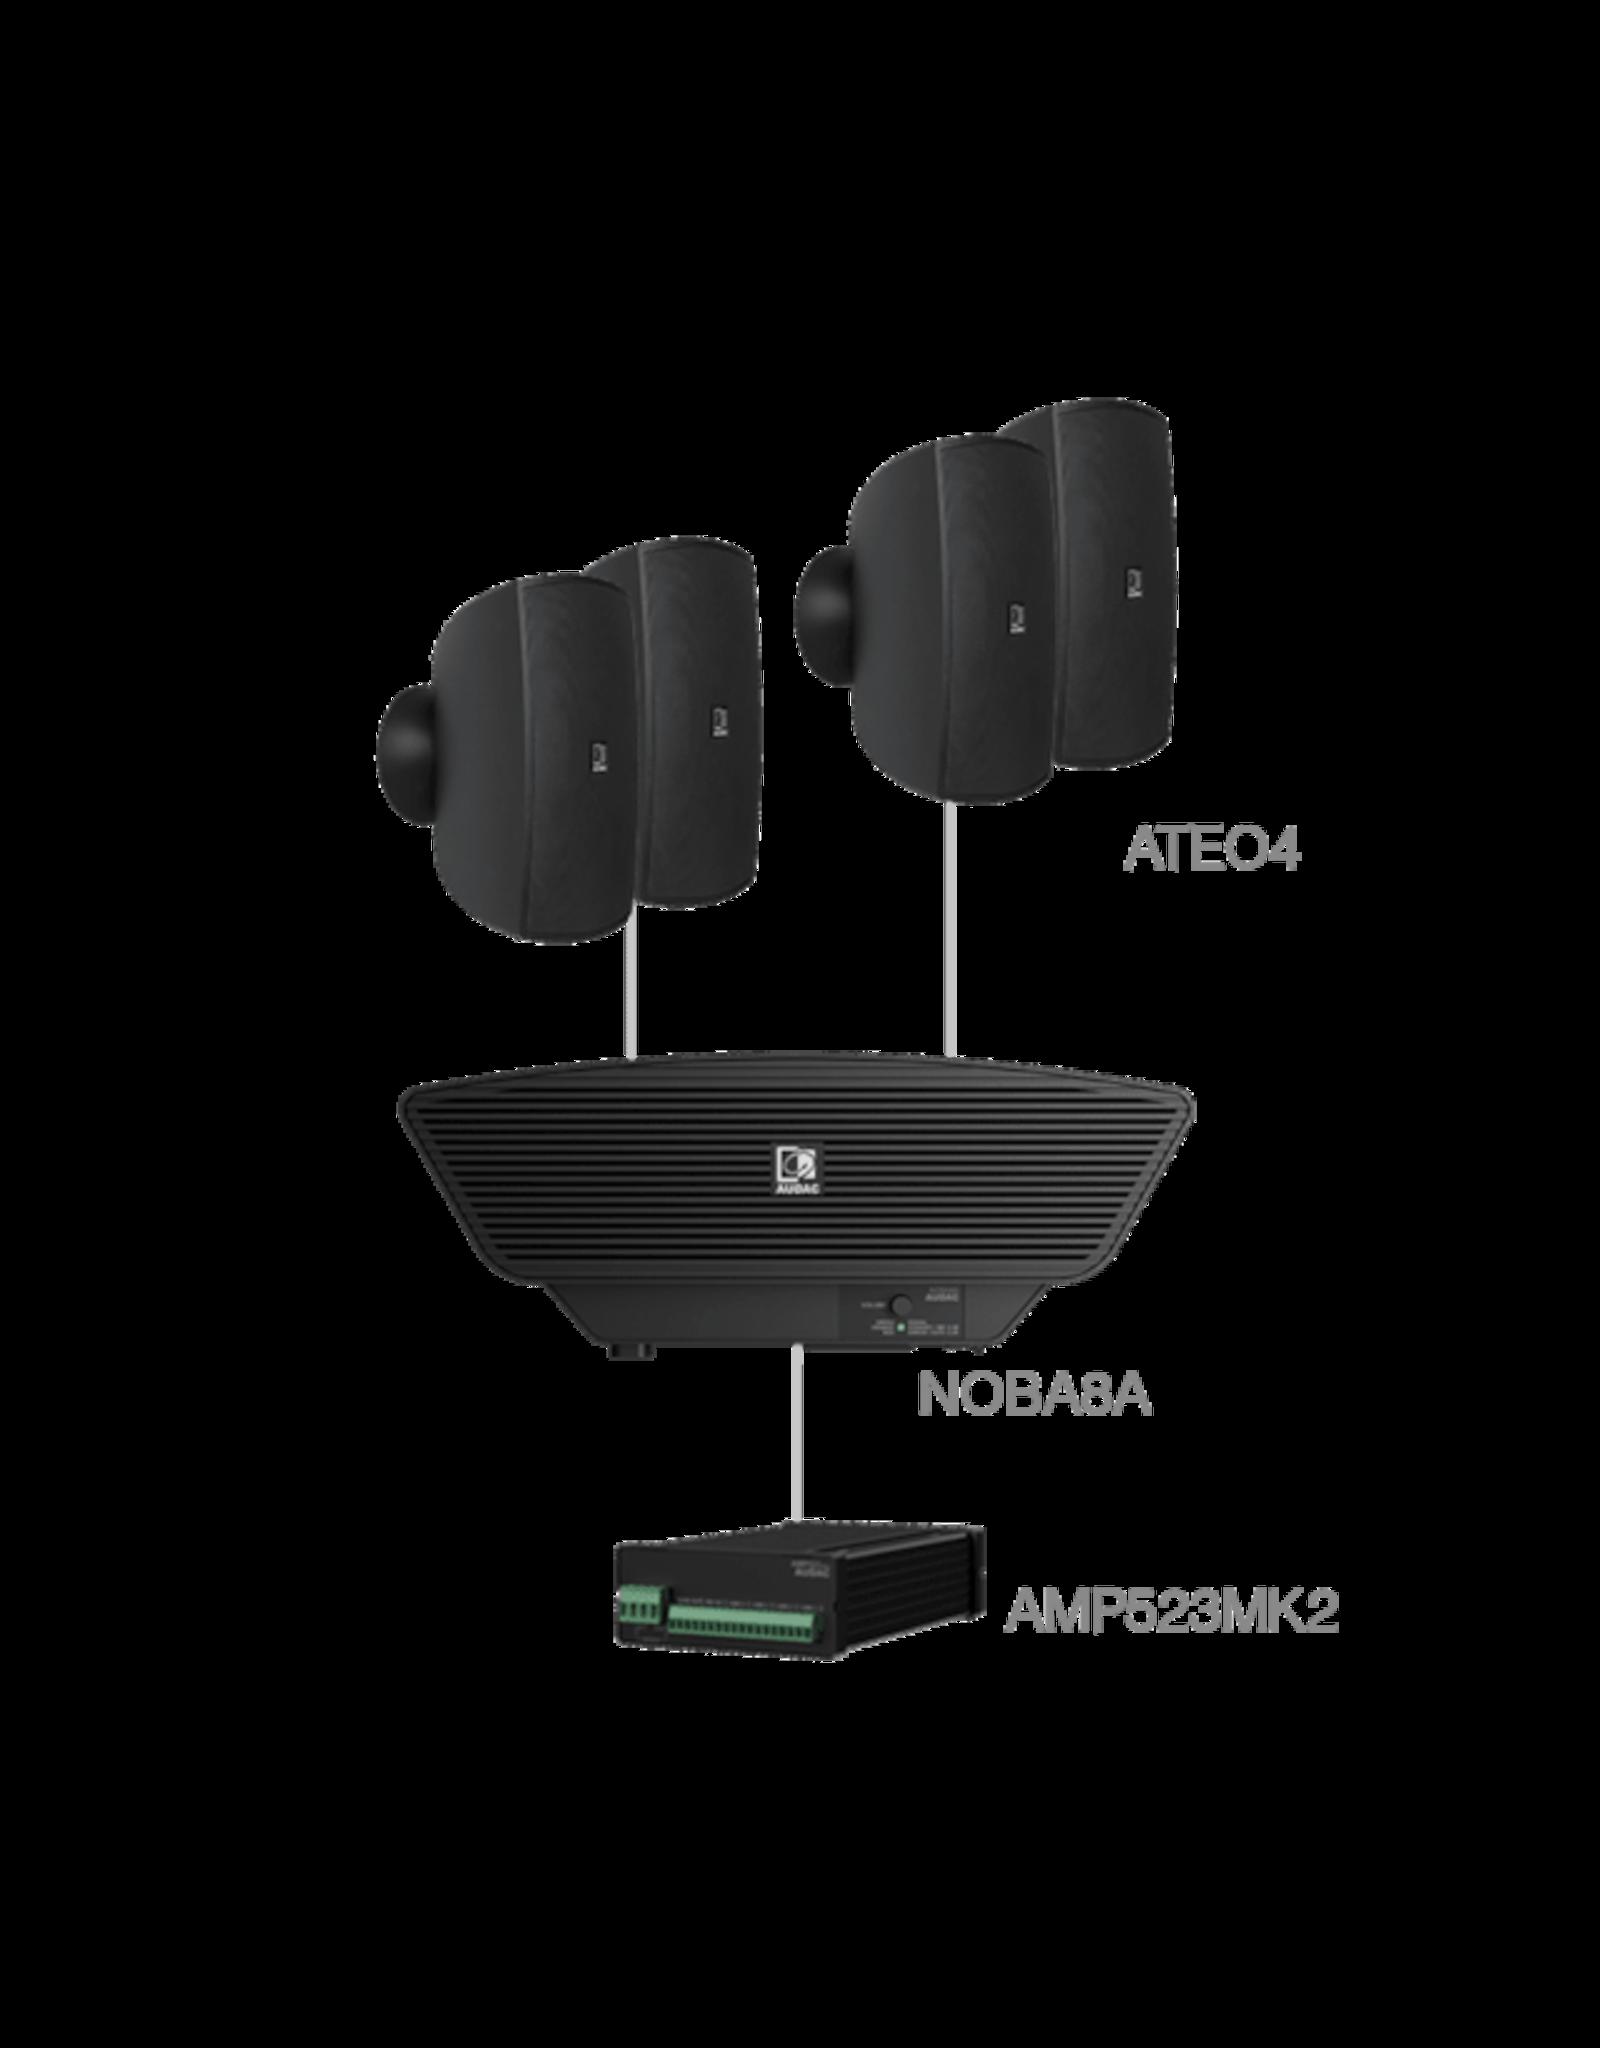 Audac 4x ATEO4  + NOBA8A +AMP523MK2 Black